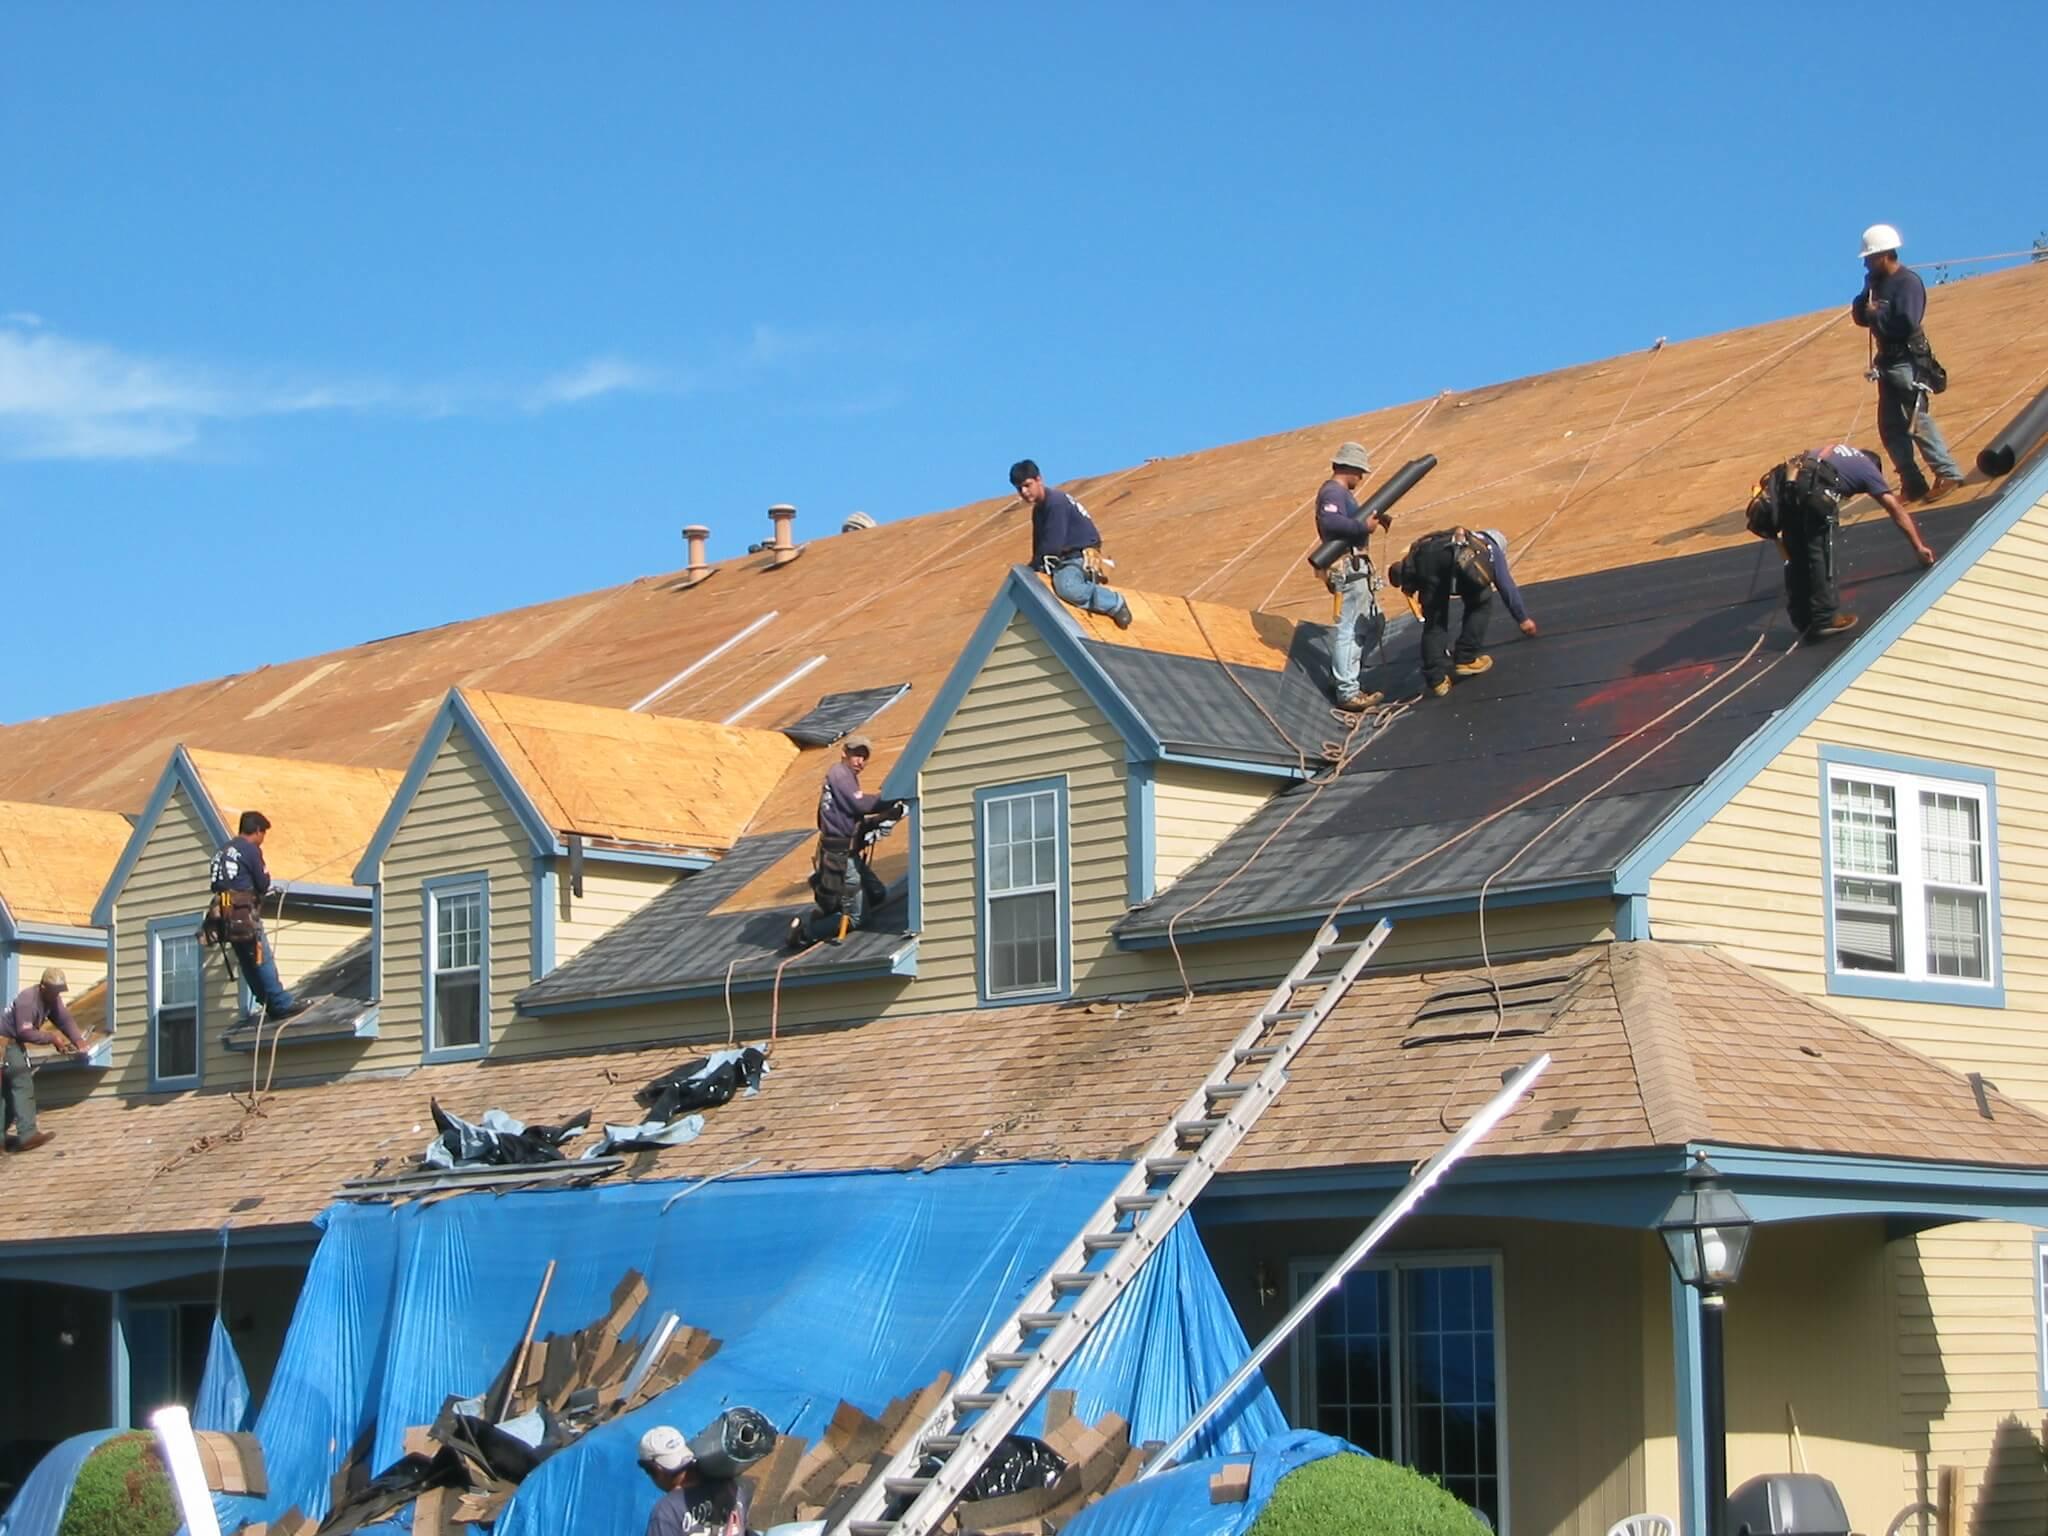 Dallas County Condominium Association Files Wind and Hail Insurance Lawsuit